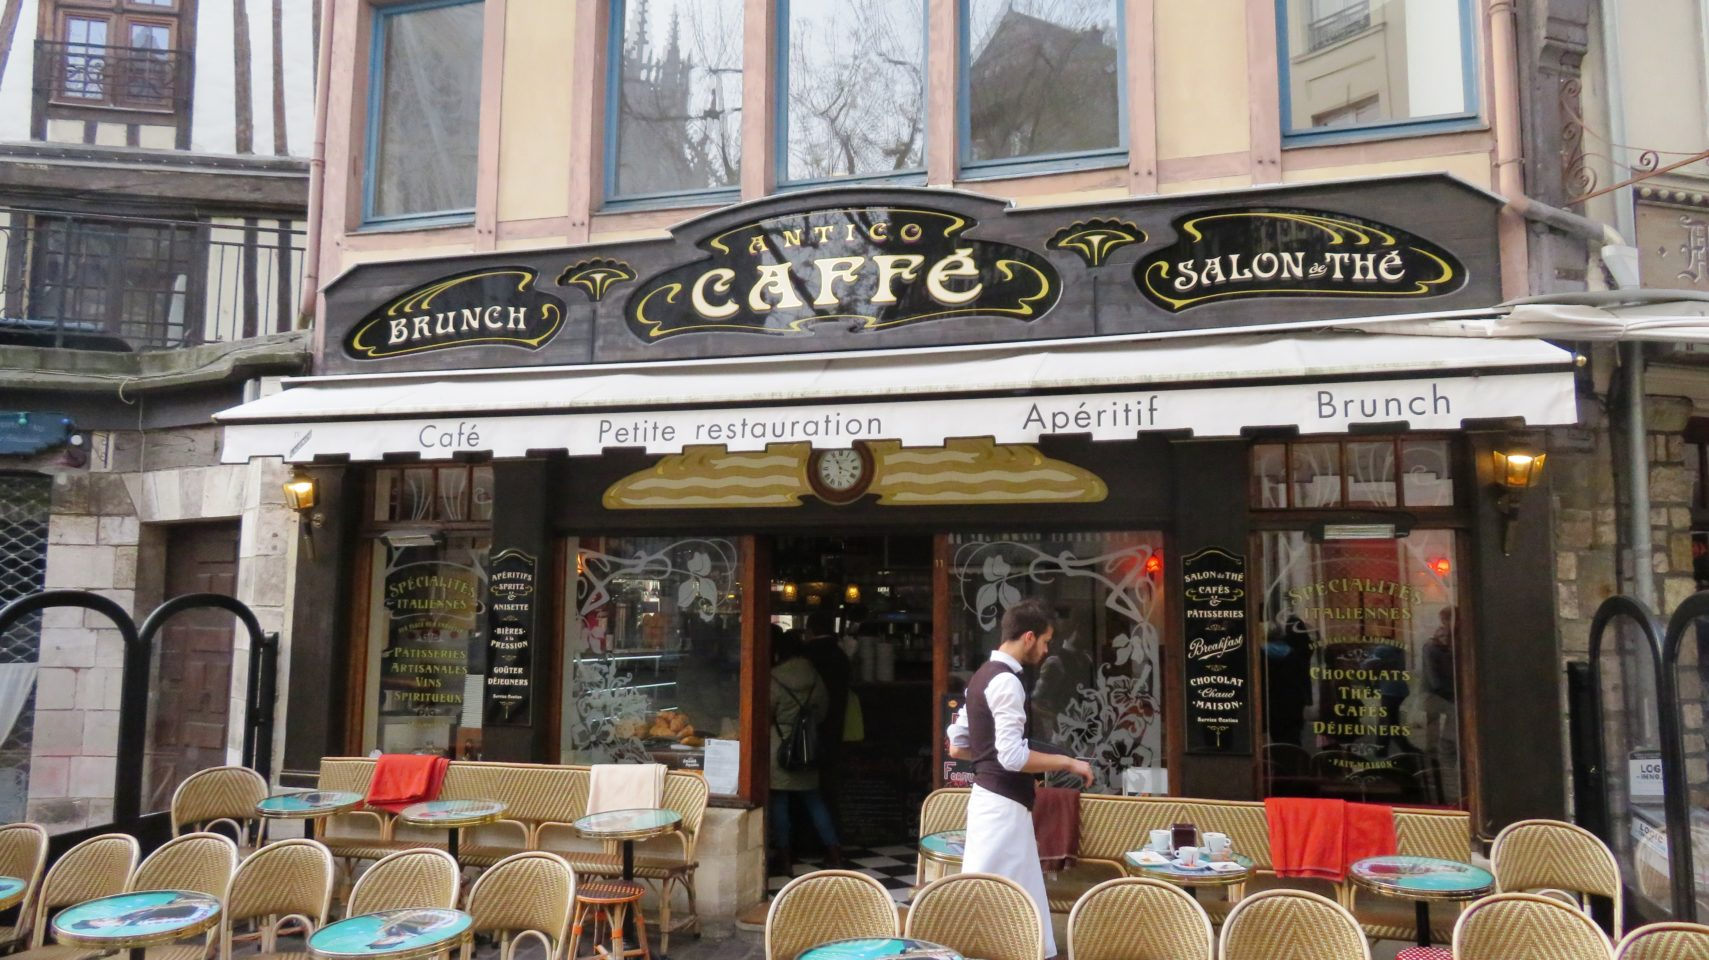 Antico Caffe in Rouen, Normandie, France (Paris and Normandie AMAWaterways Cruise)